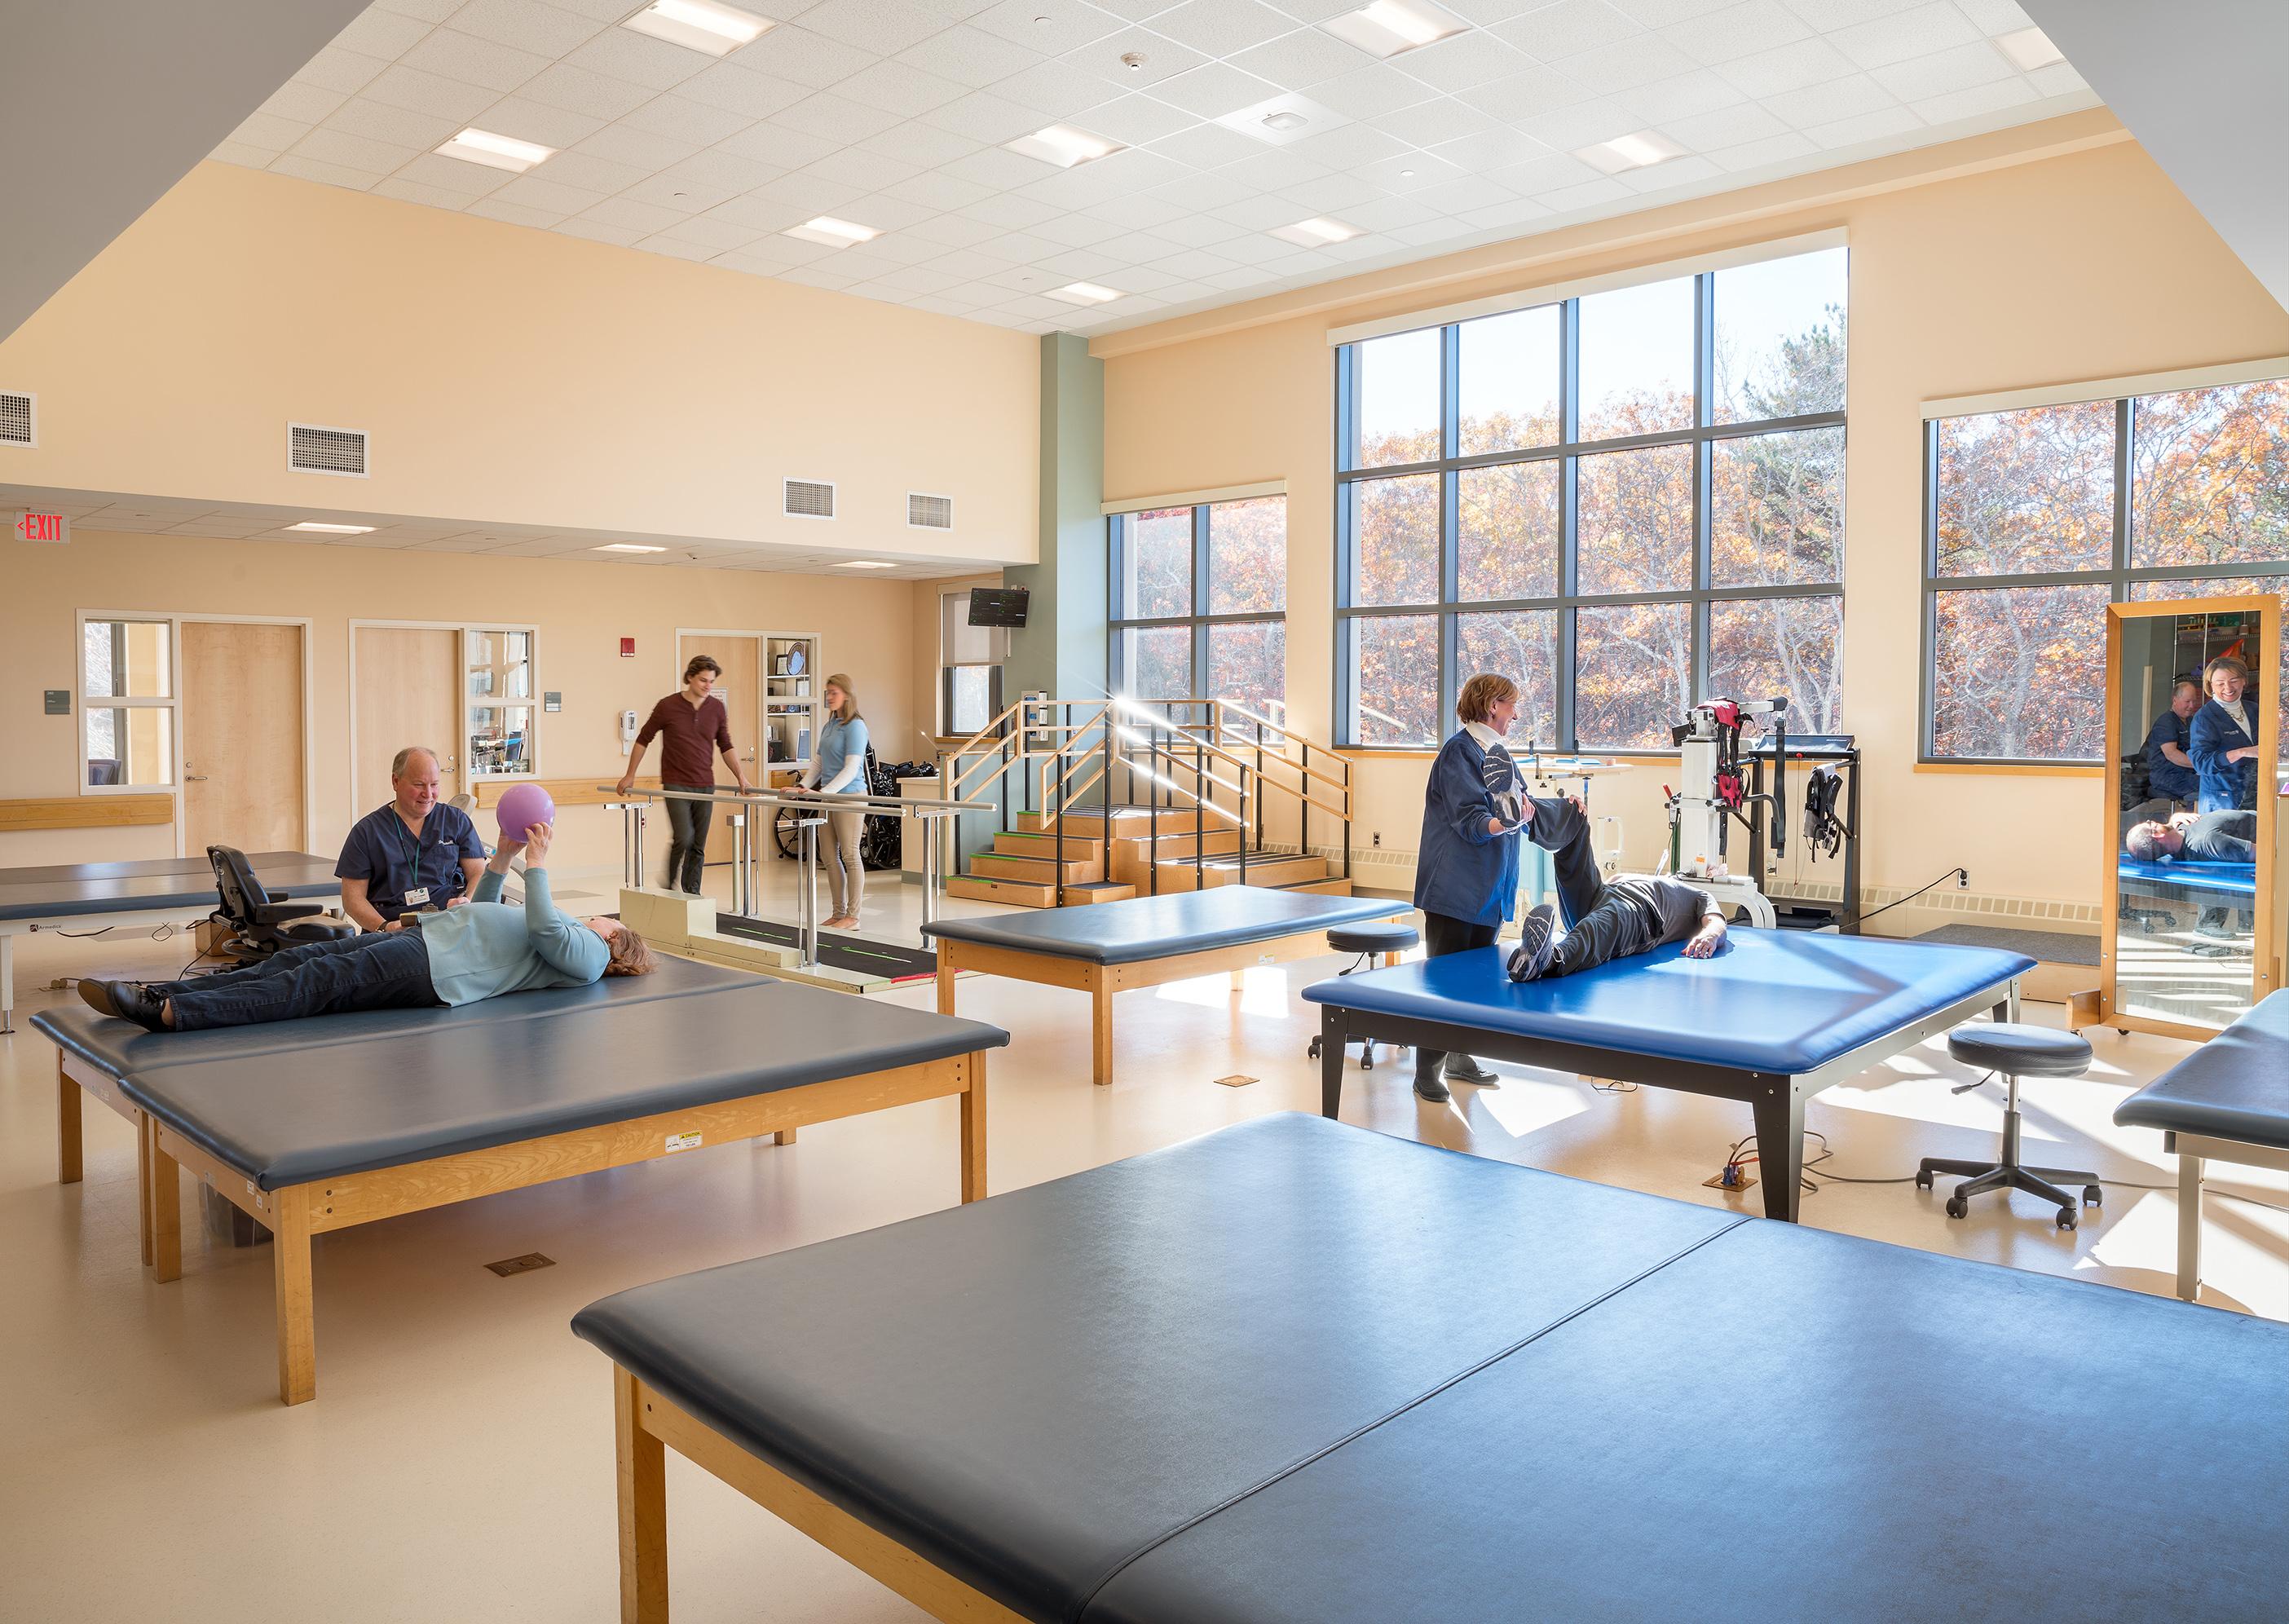 Spaulding Rehabilitation Hospital Cape Cod Expansion Complete